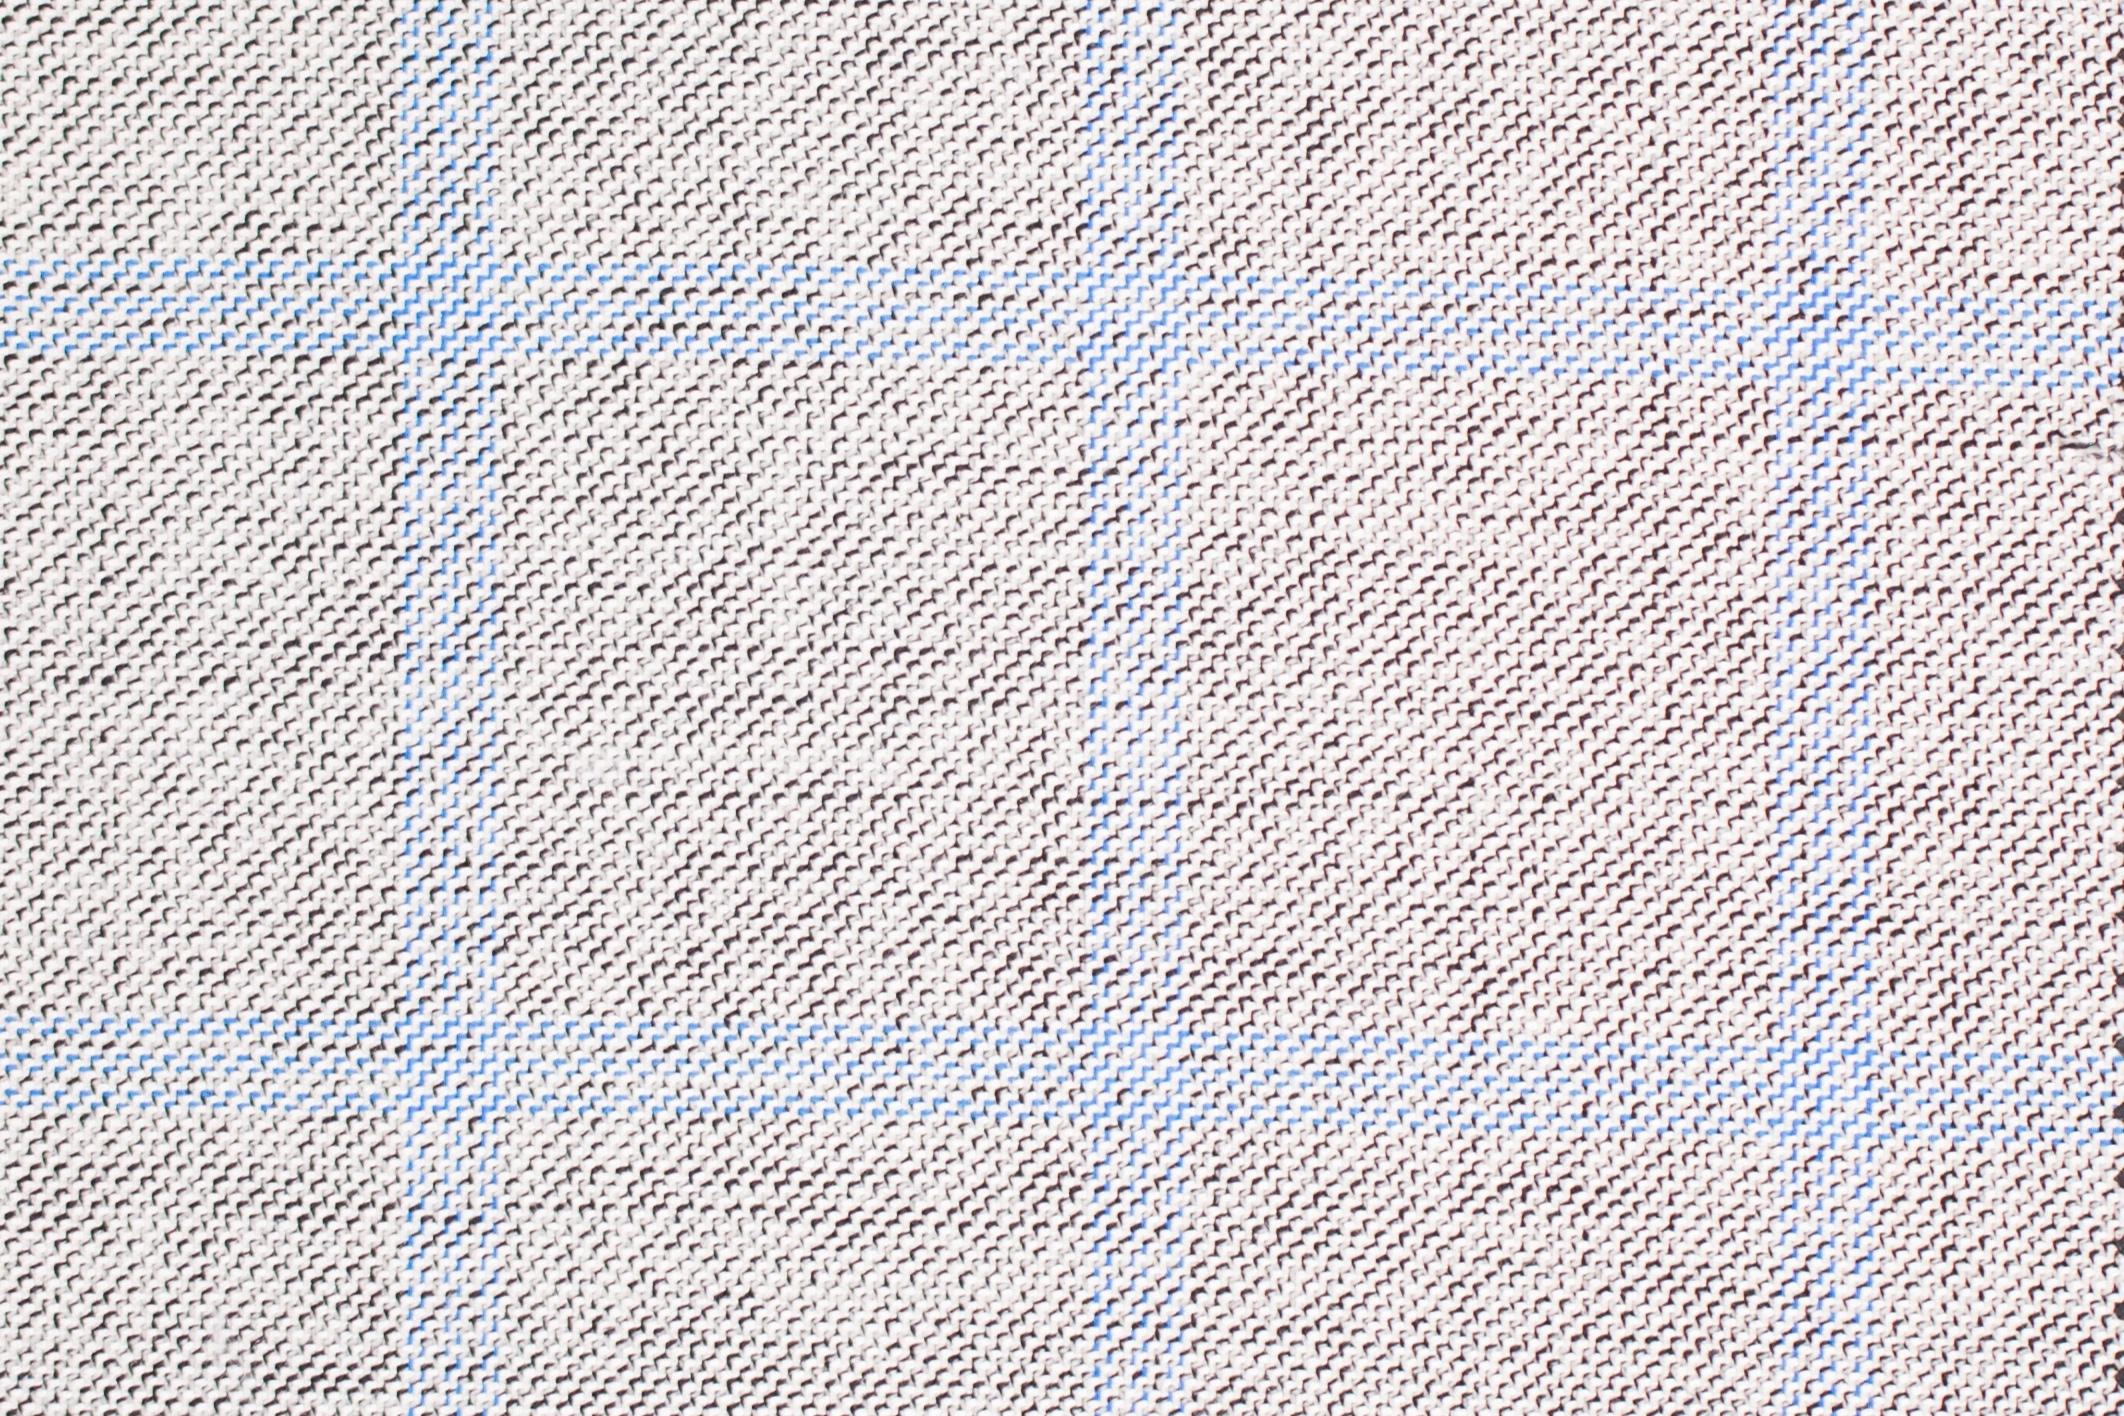 BA/MD 1692 LT GREY/BLUE WINDOWPANE